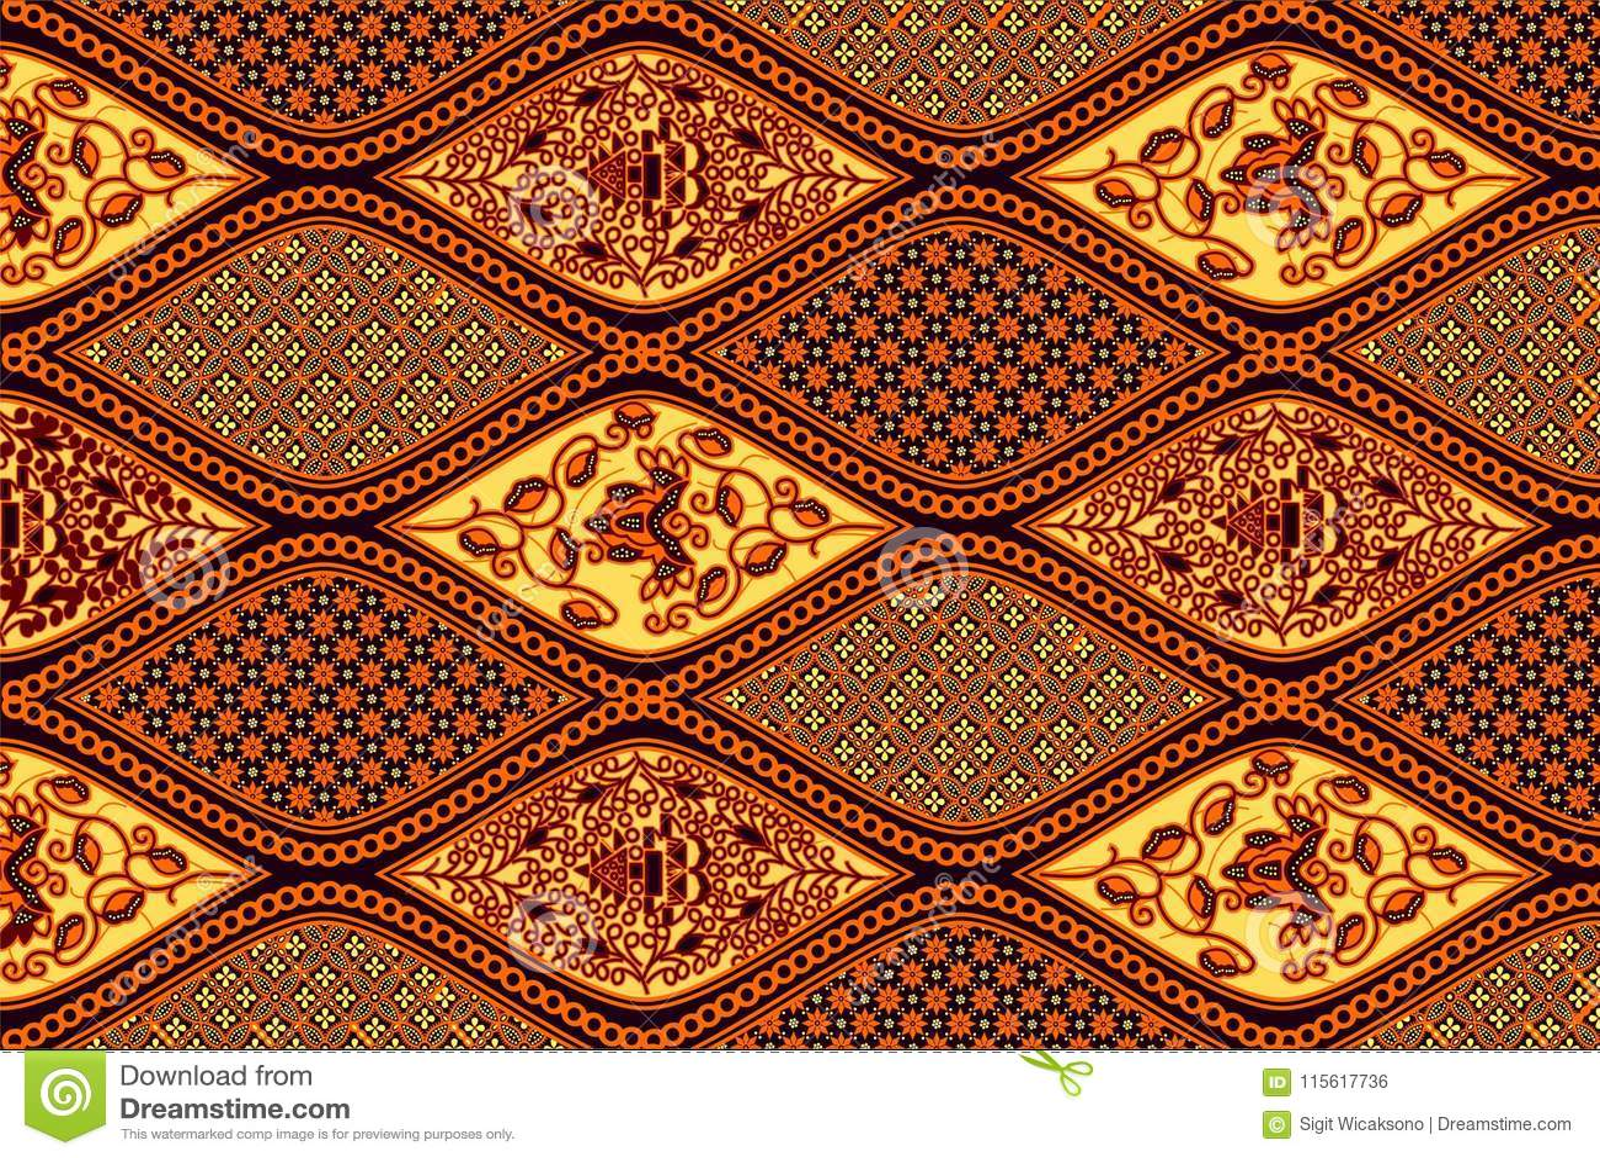 Batik solo pattern stock illustration. Illustration of indonesian ... 45e112ea11